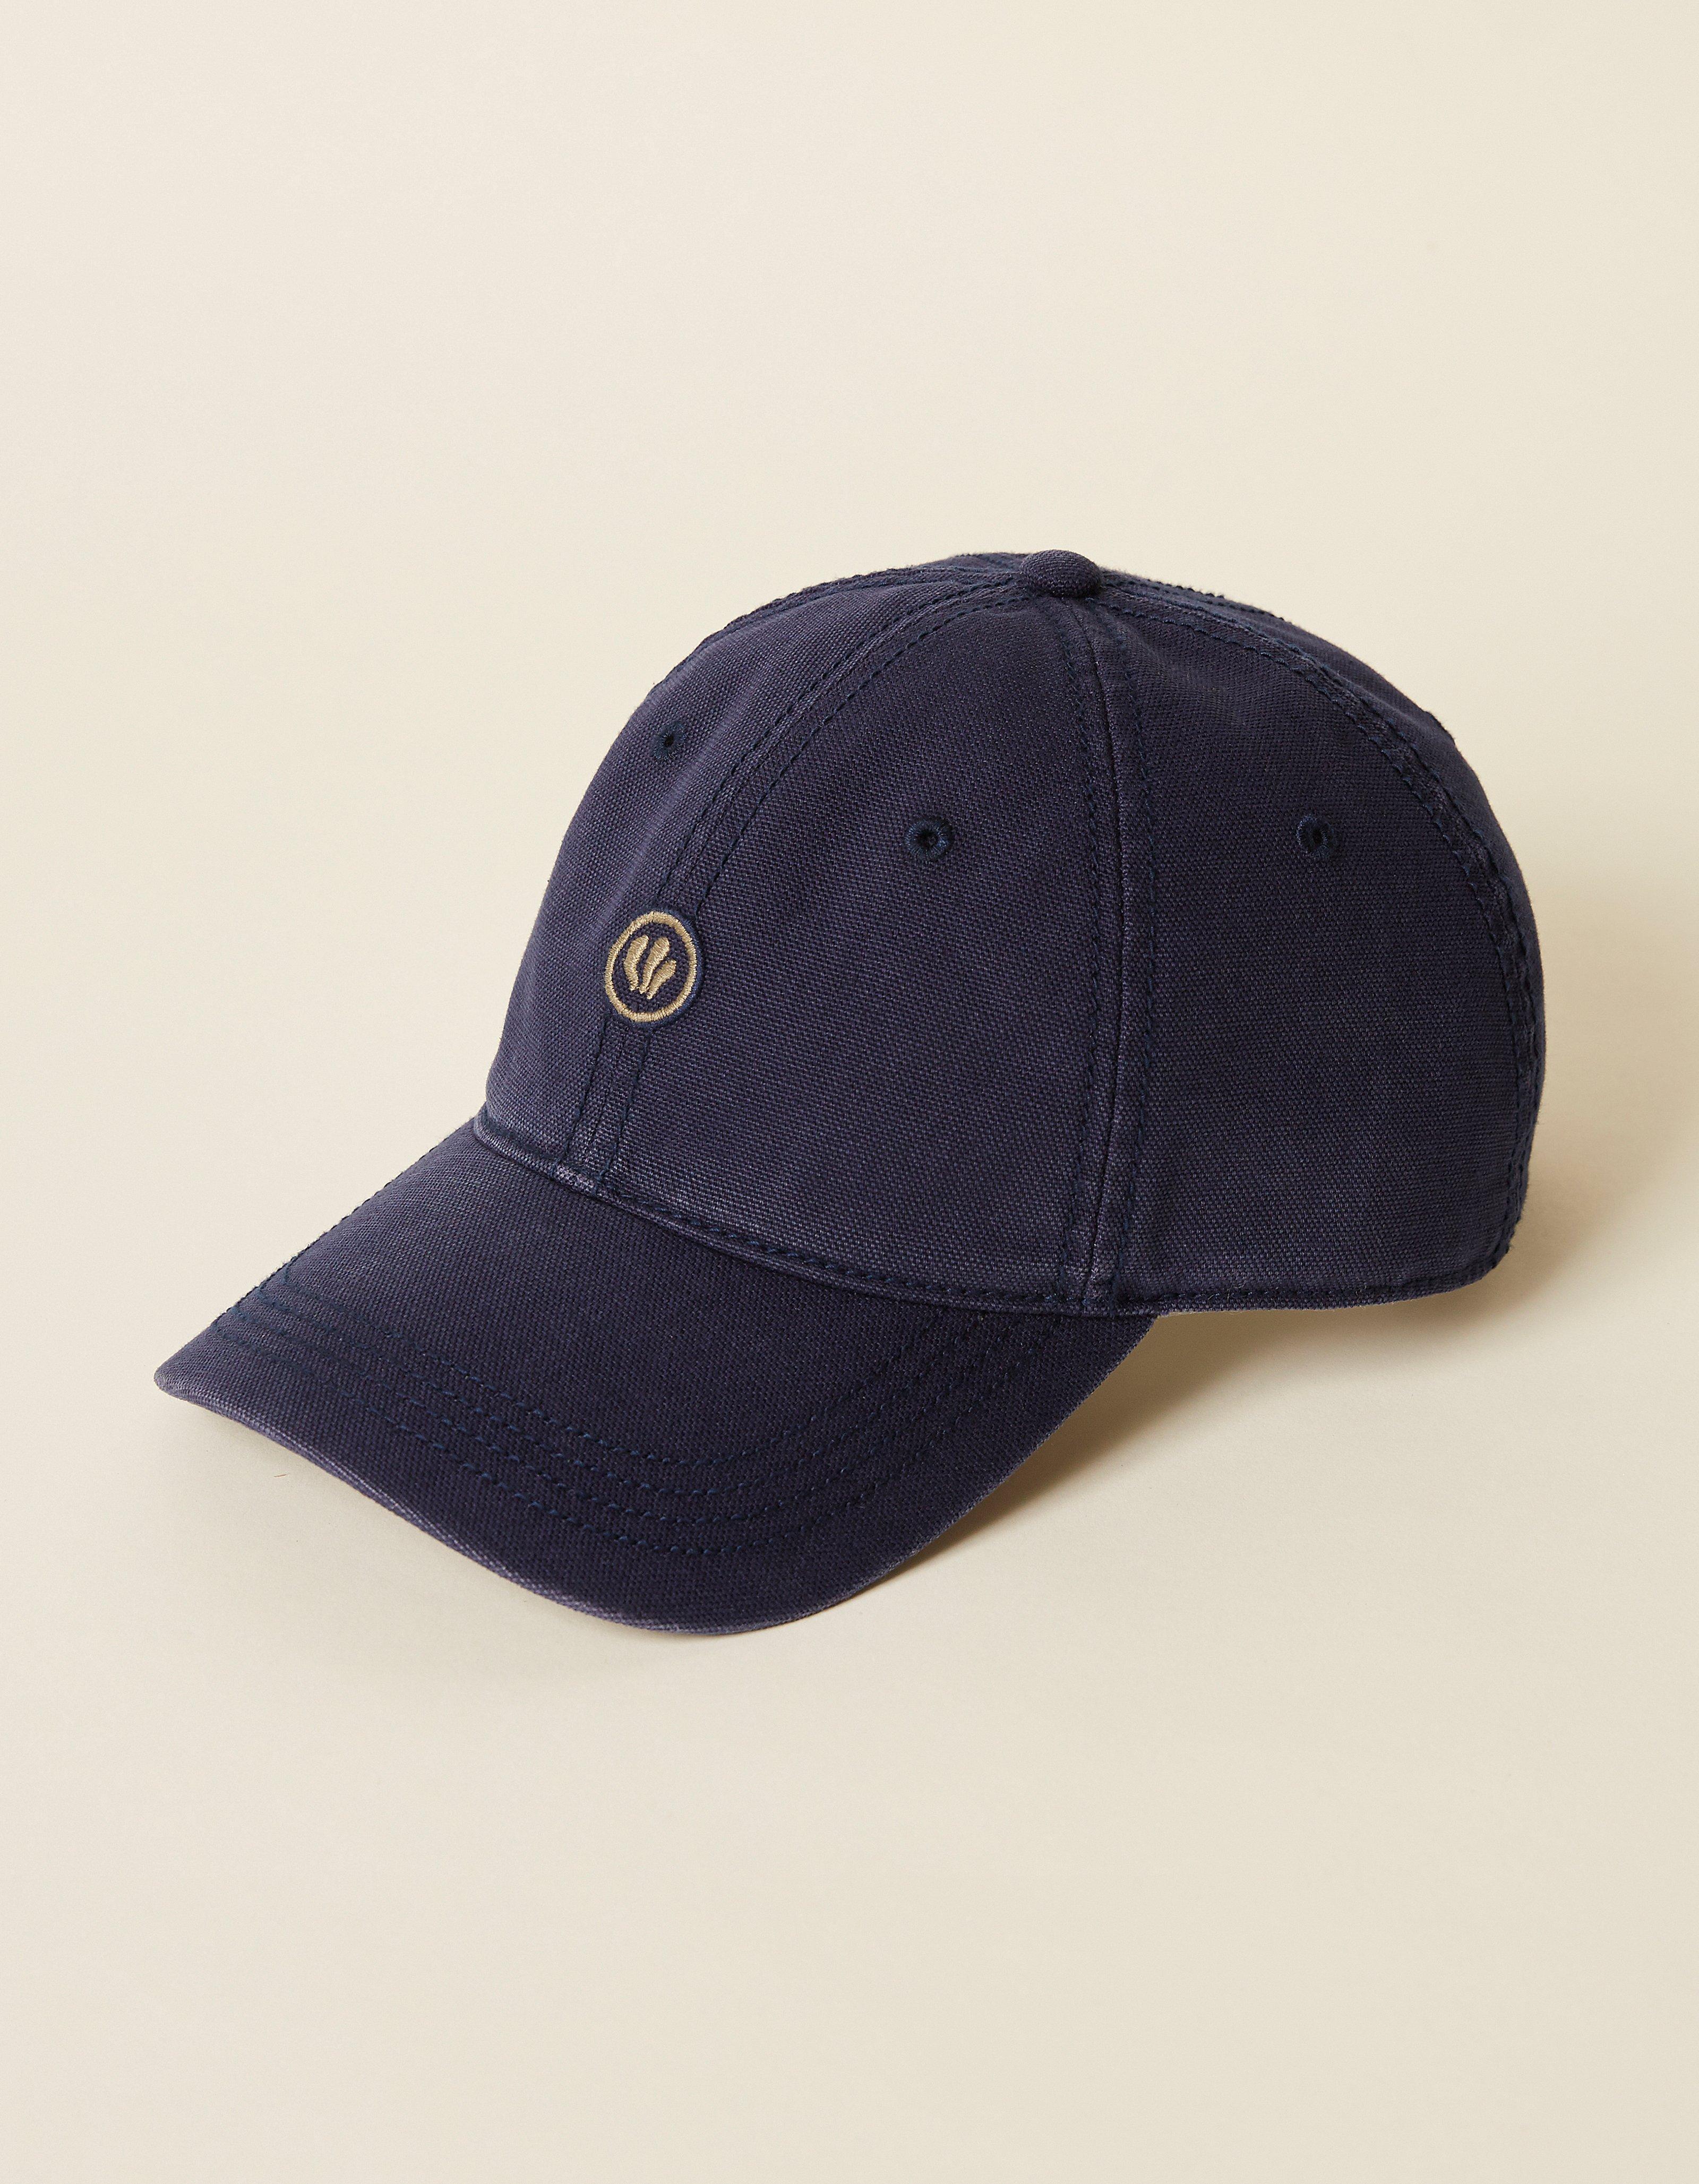 a2fd3140b4 Navy Plain Baseball Cap